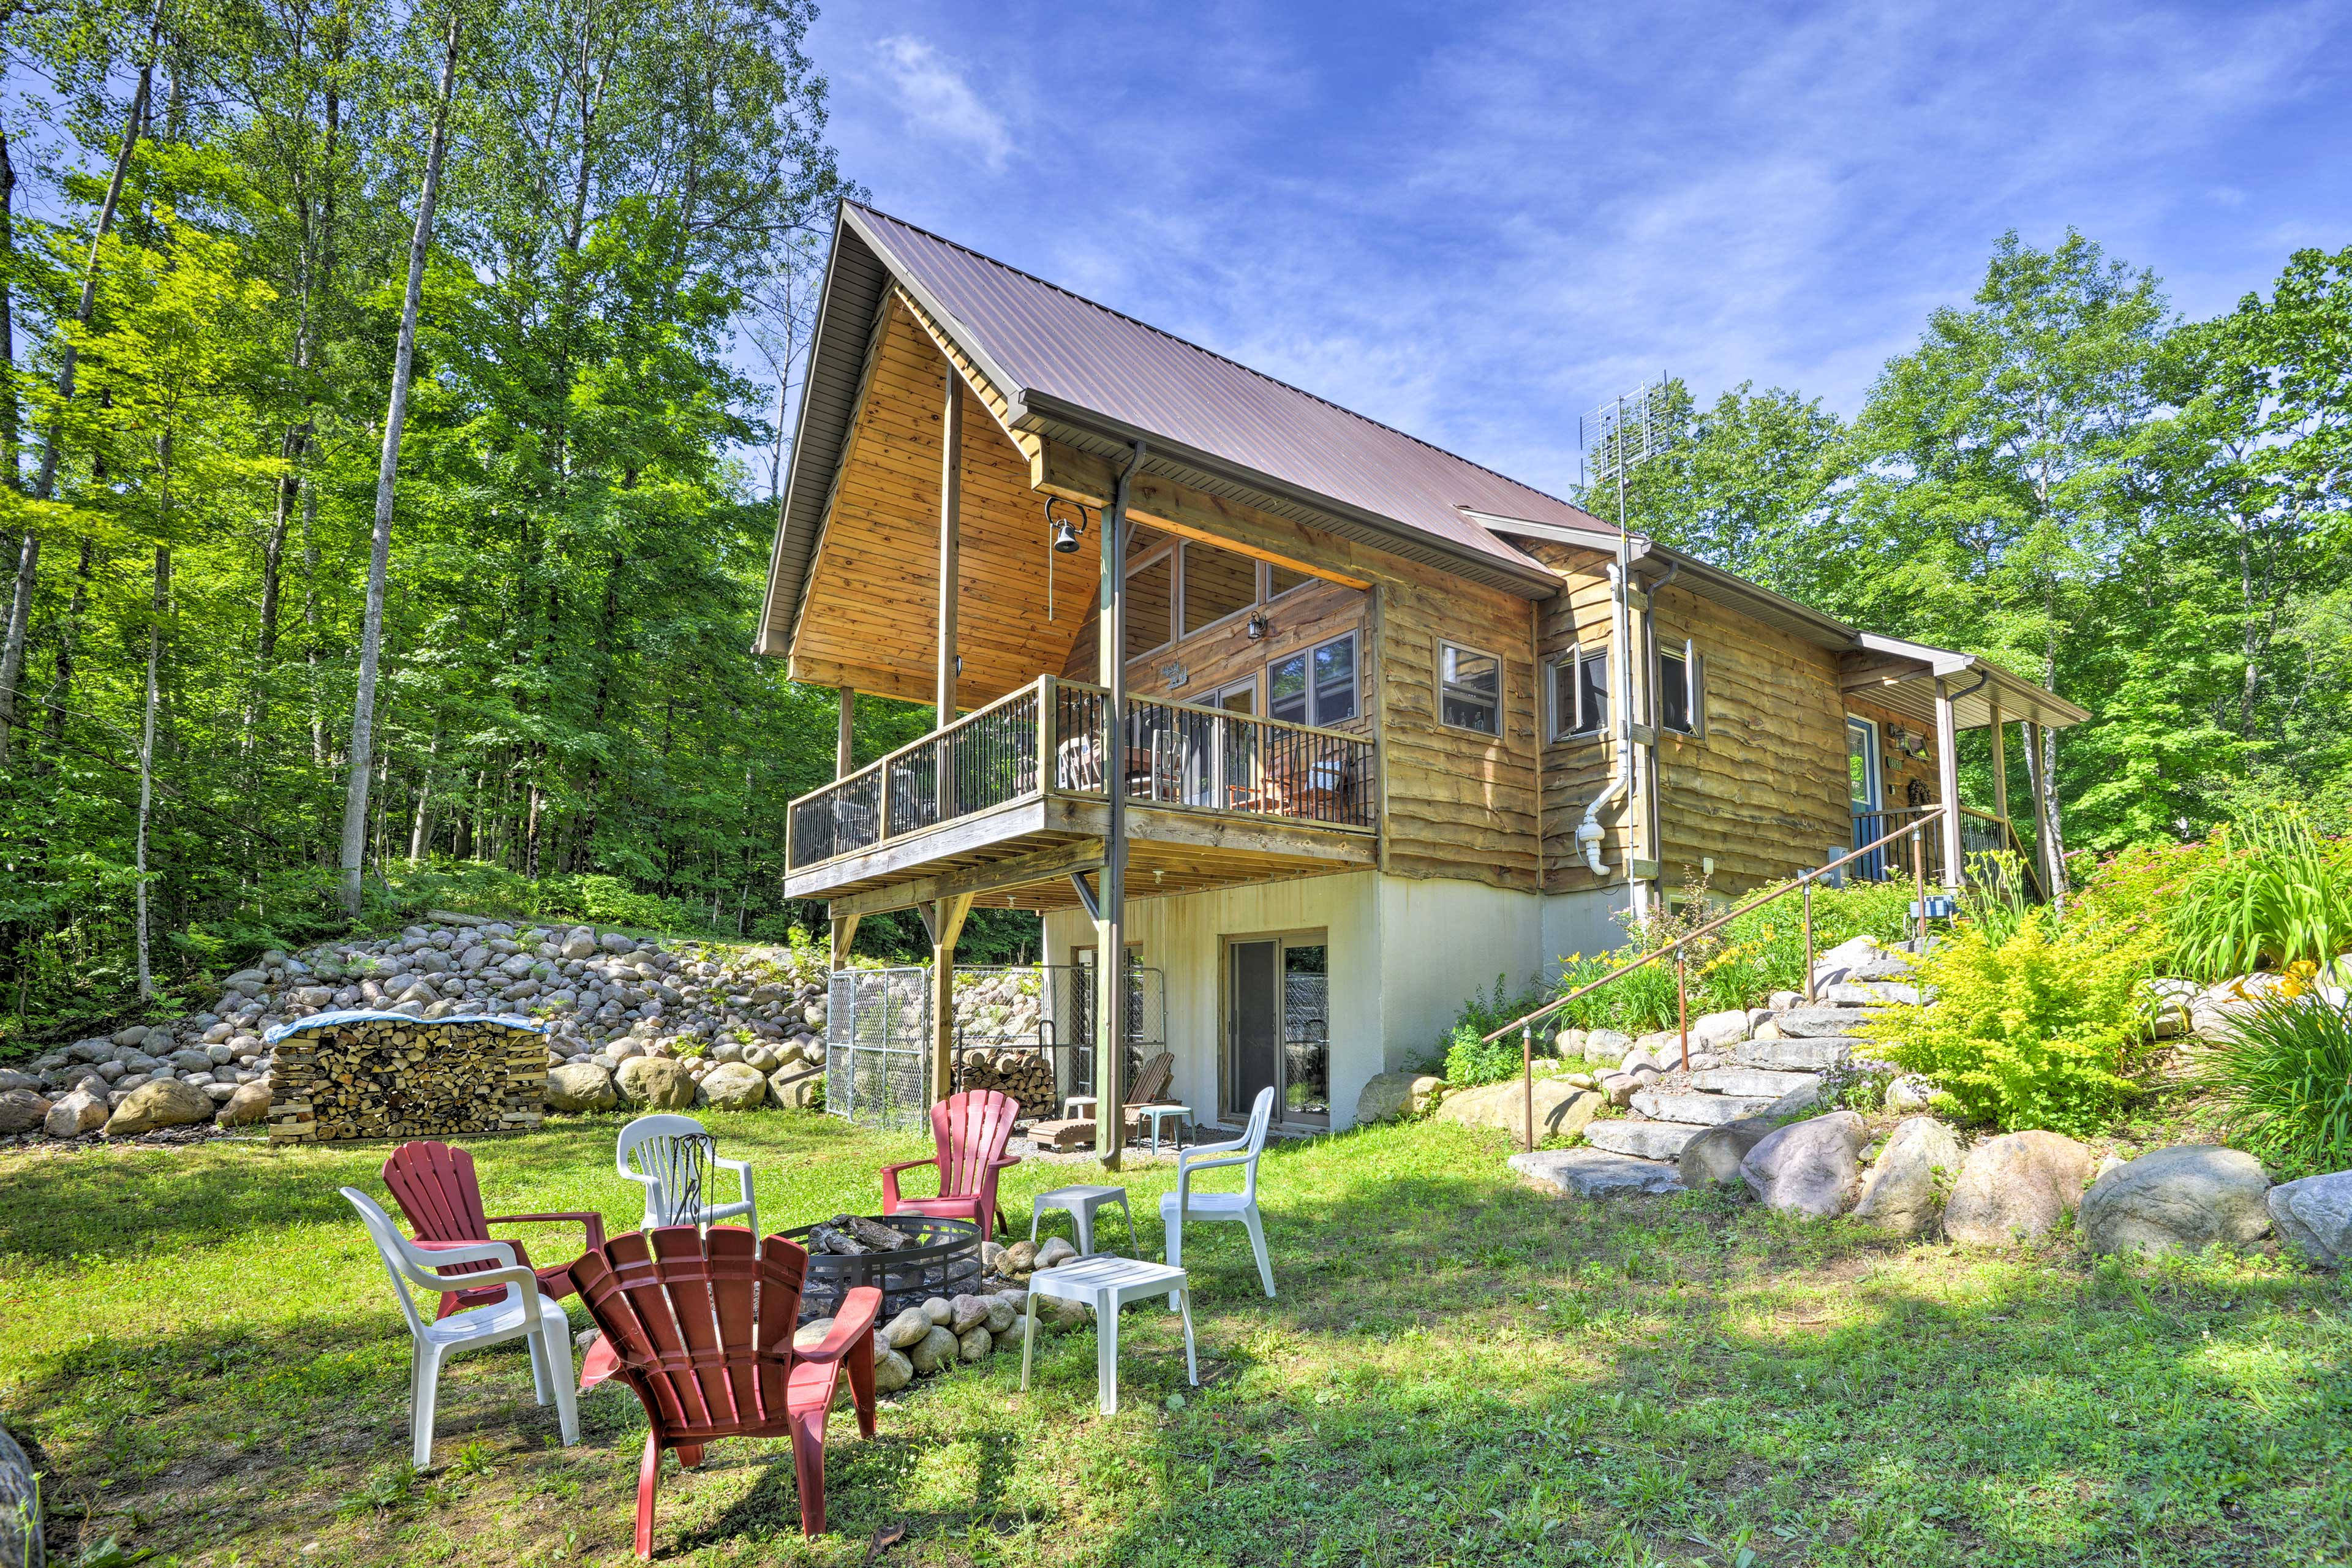 Glenfield Vacation Rental   3BR + Loft   2BR   2,000 Sq Ft